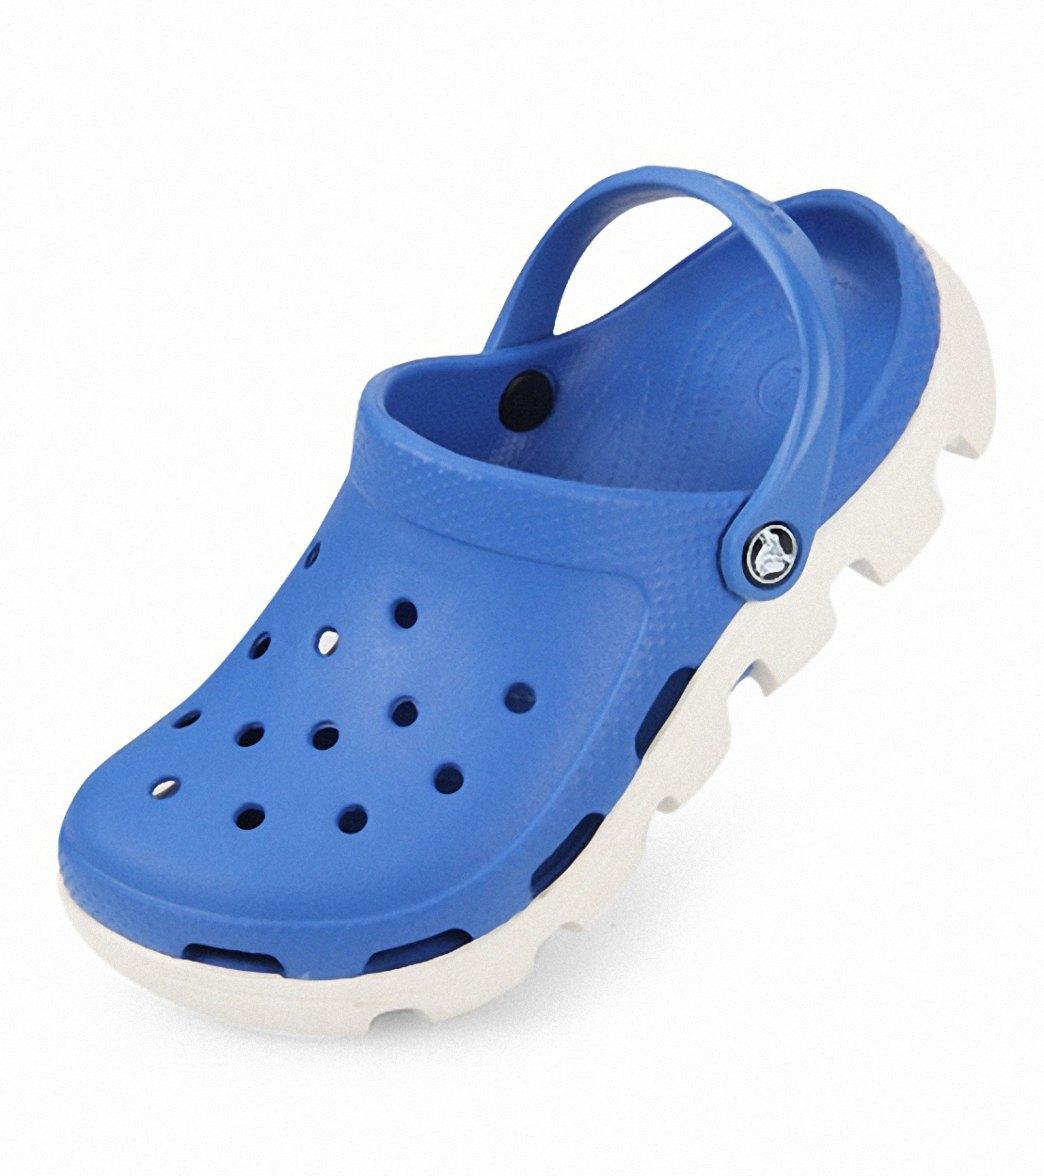 Crocs Duet Sport Clog at SwimOutlet.com - Free Shipping 80985e10d